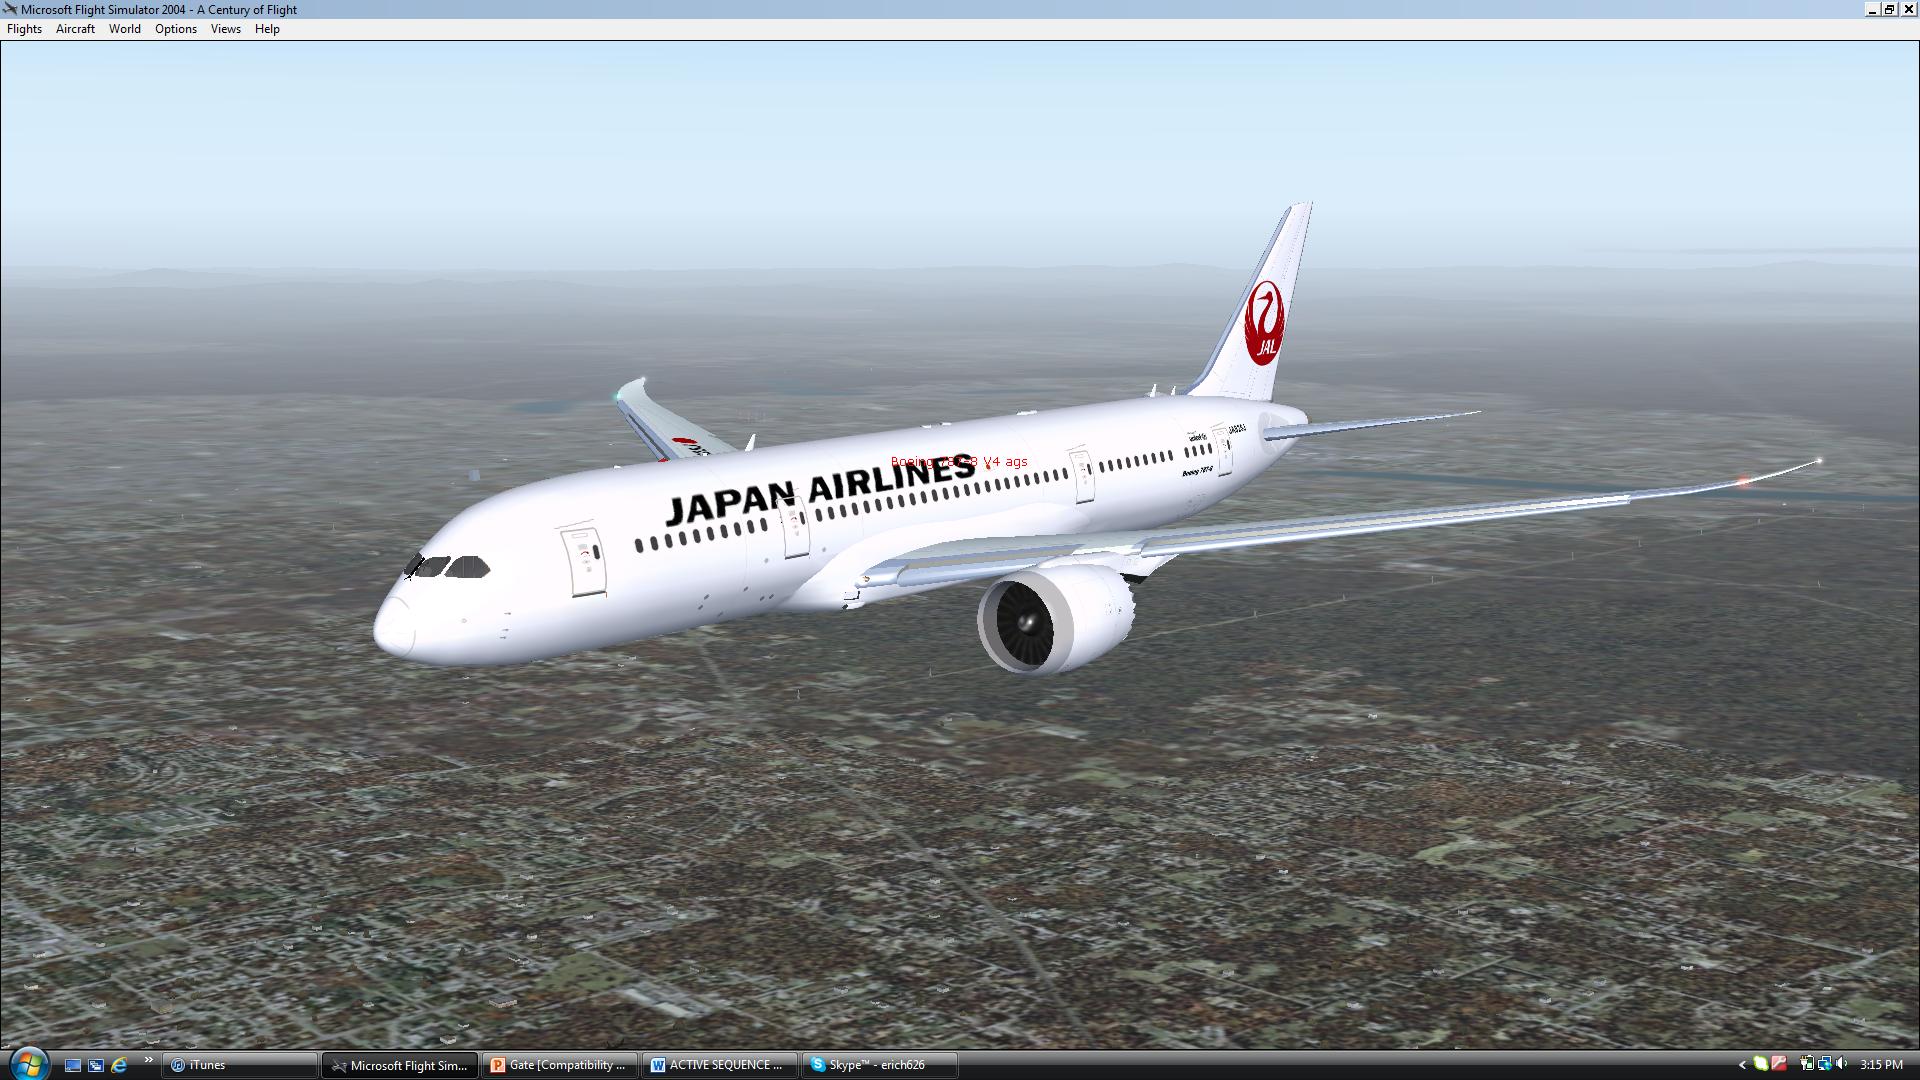 jal flight 8 approaching